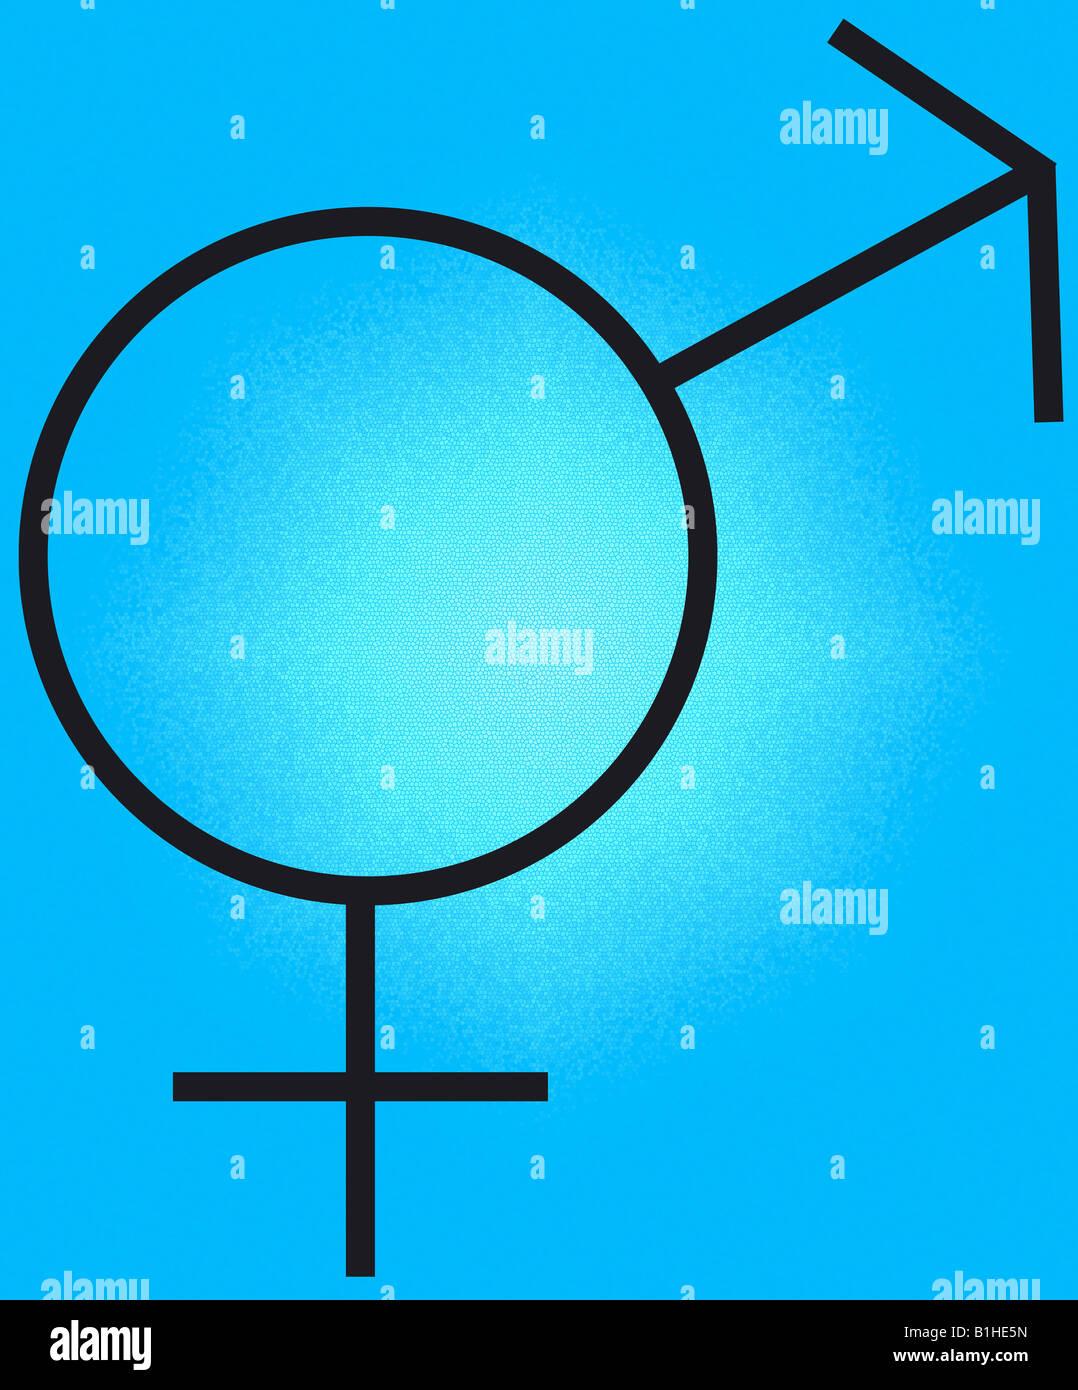 Xy Male And Female Symbols Sex Gender Male Female Same Man